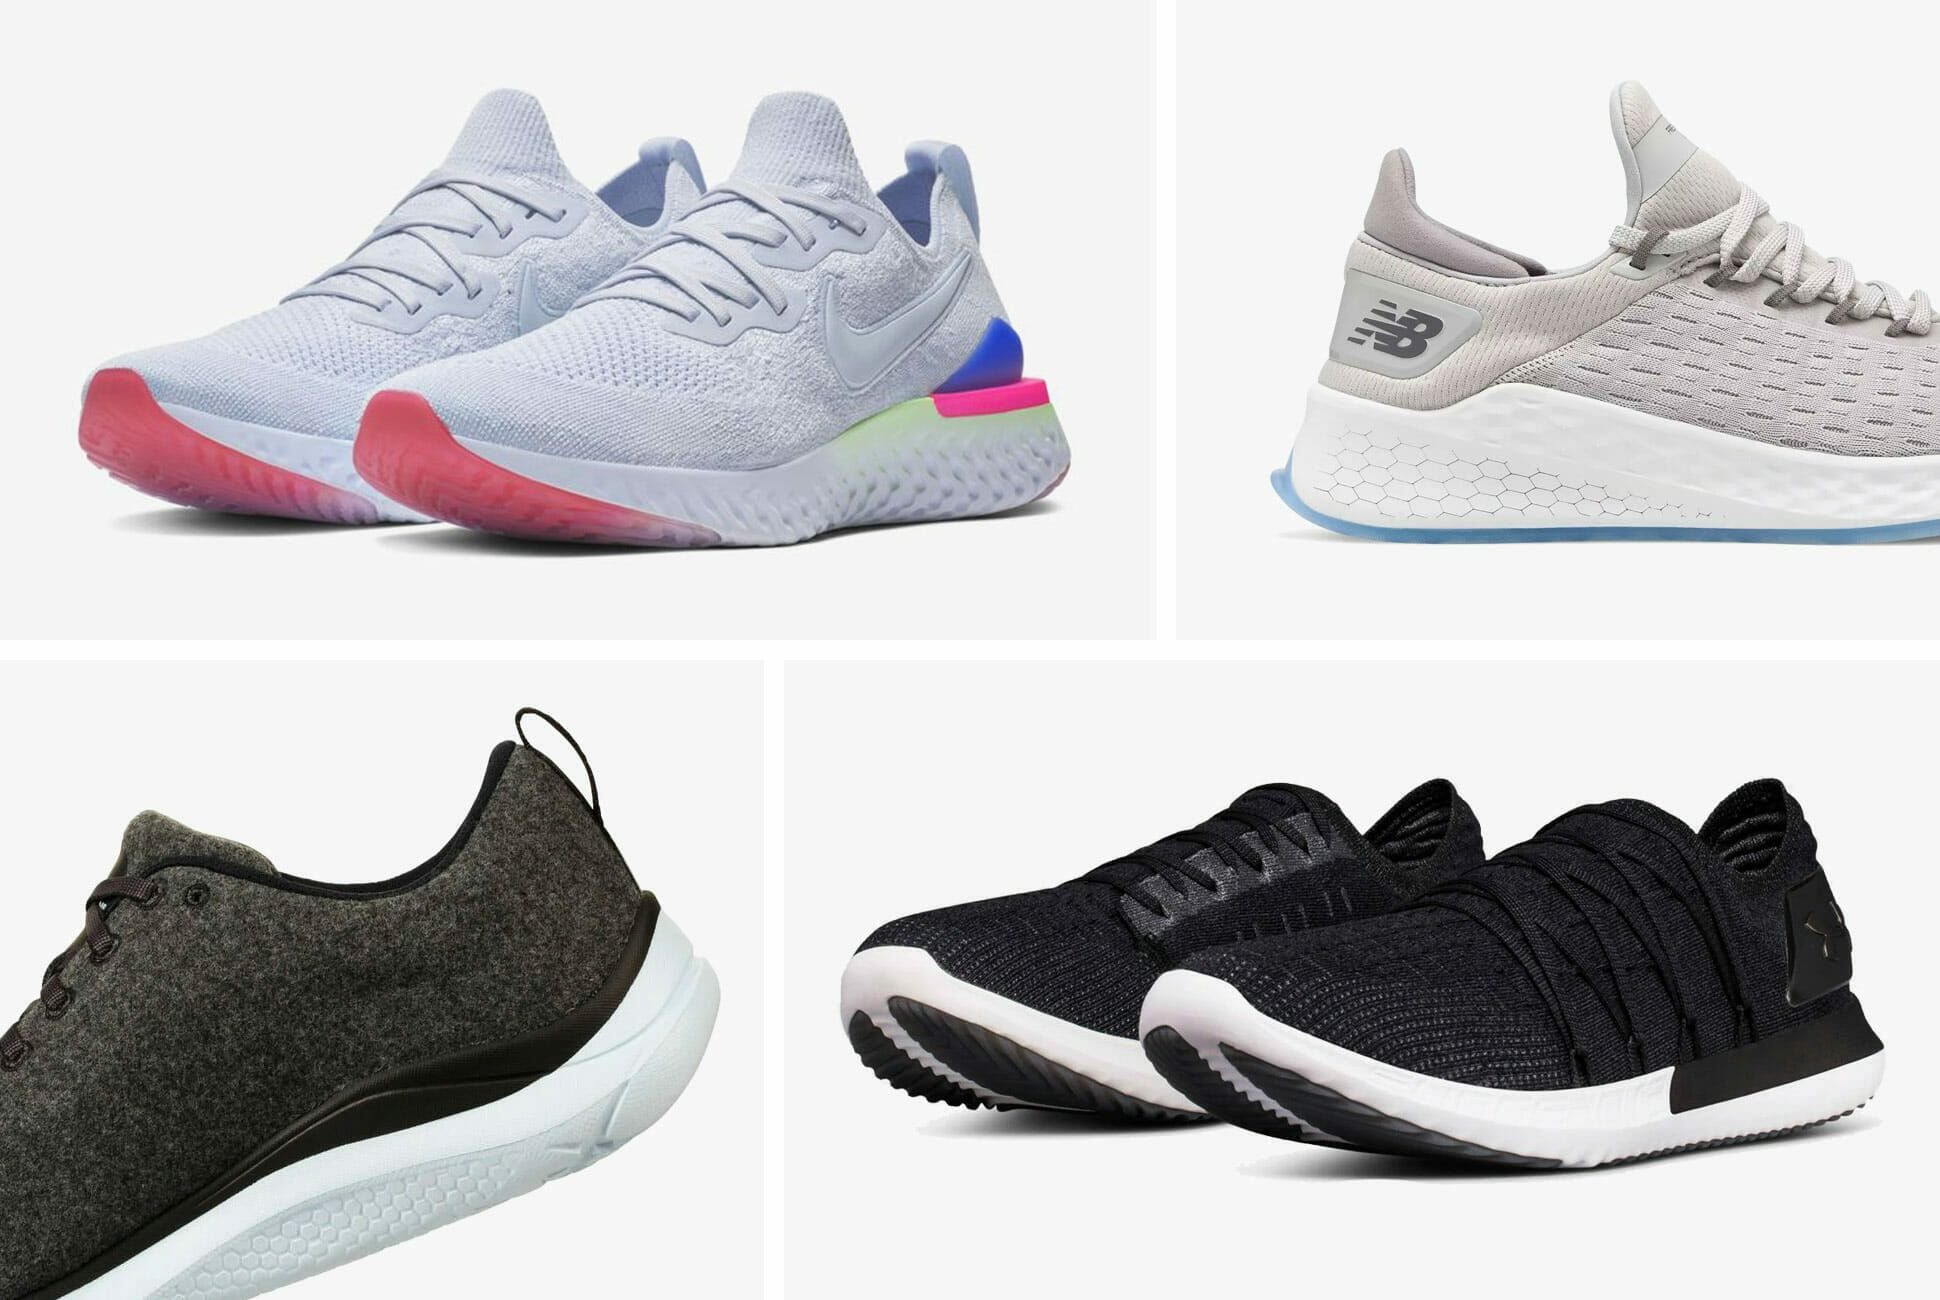 lightest sneakers 2019